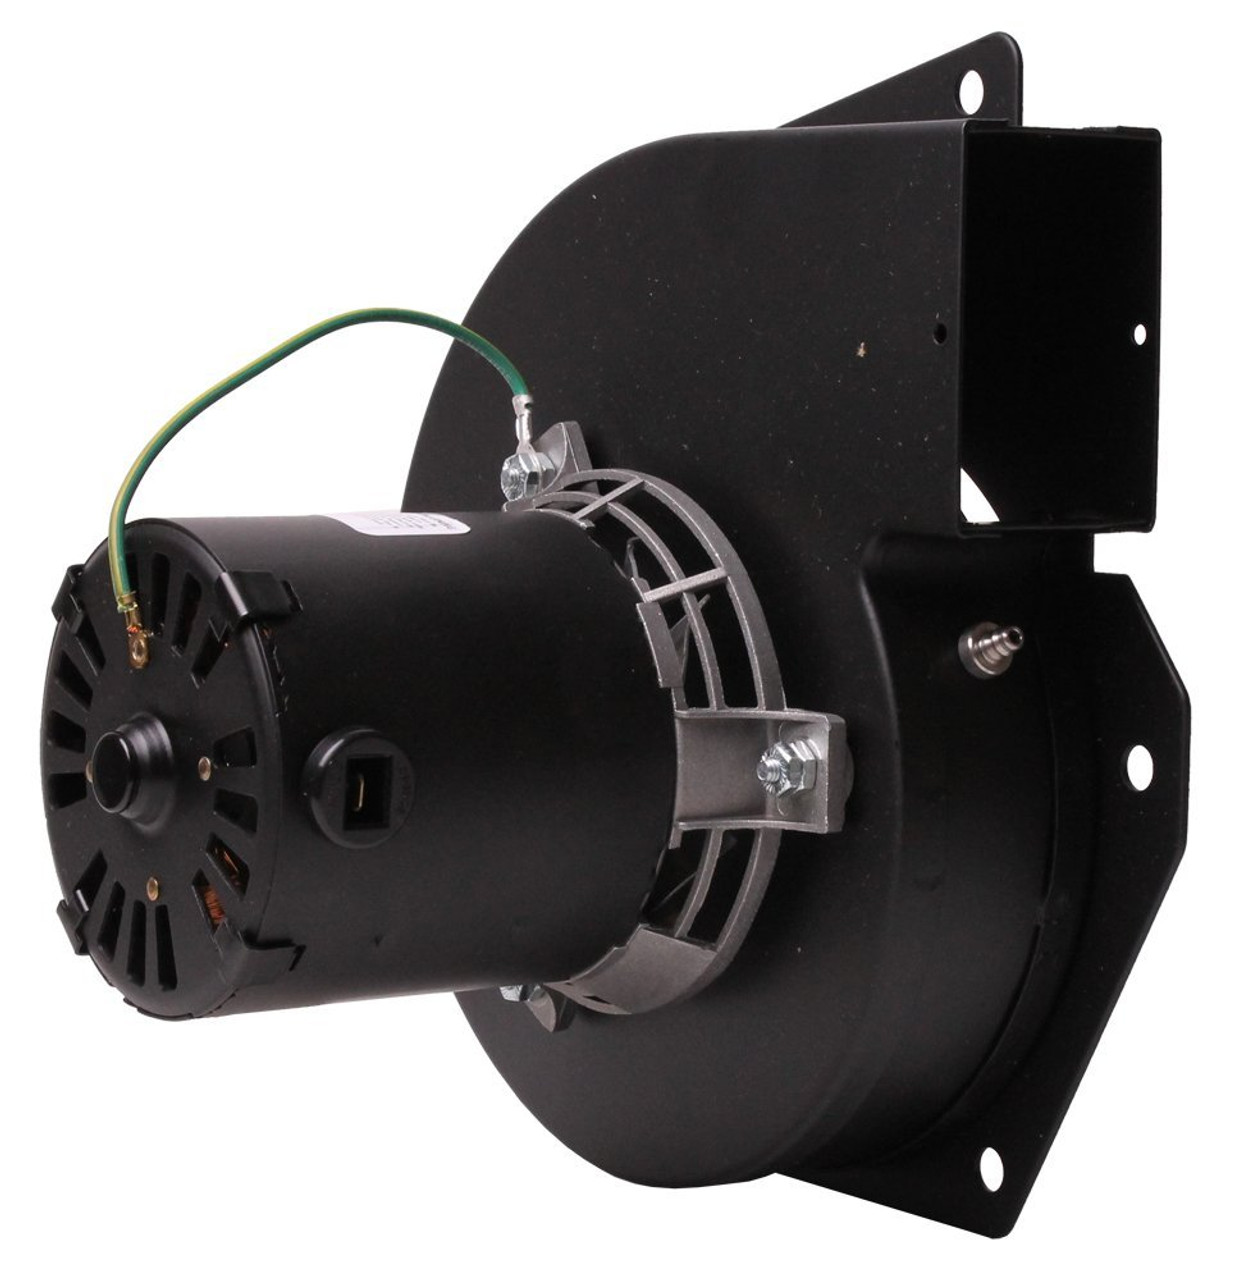 medium resolution of intercity furnace hq1054268fa draft inducer blower 208 230v fasco a148